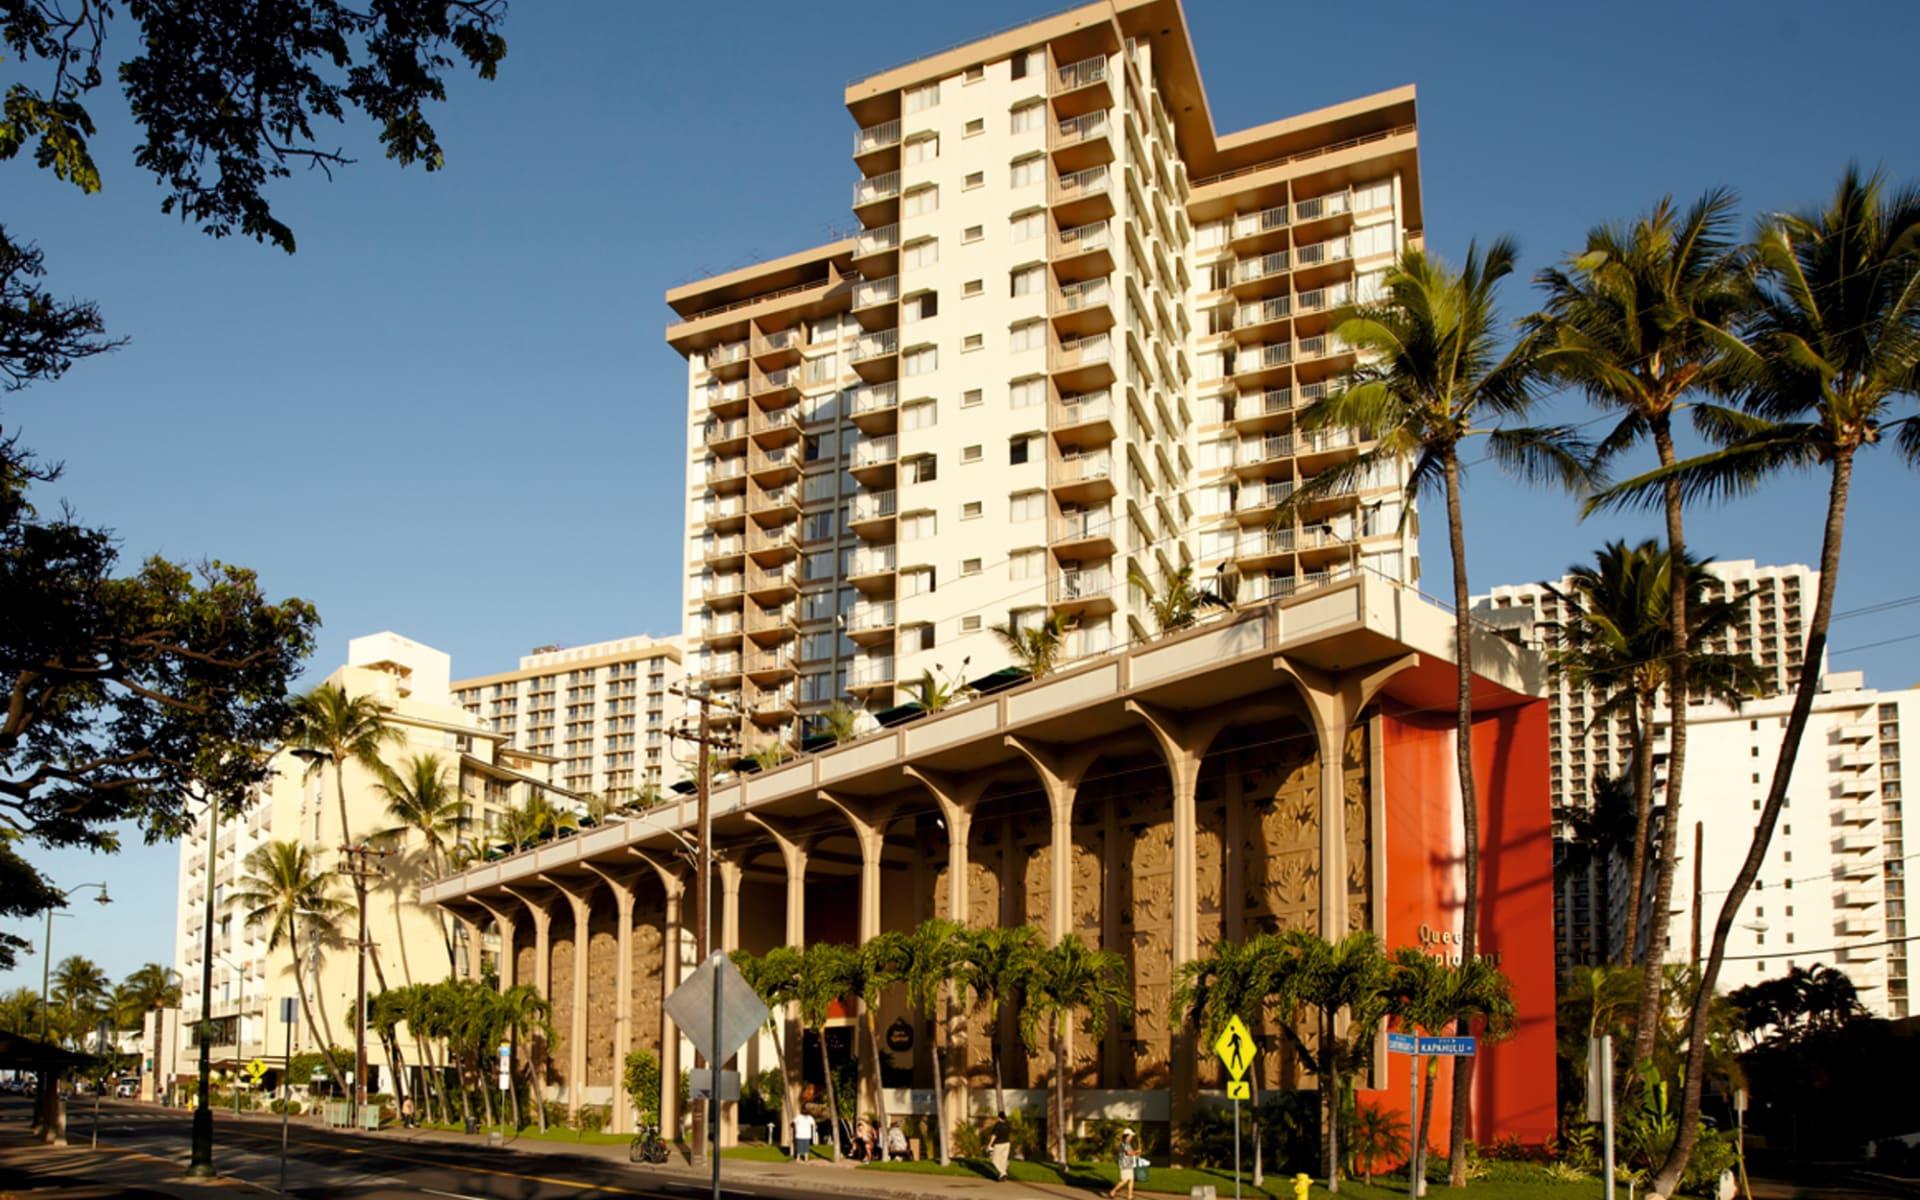 Queen Kapiolani Hotel in Honolulu - Oahu:  Queen Kapiolani Hotel - Aussenansicht